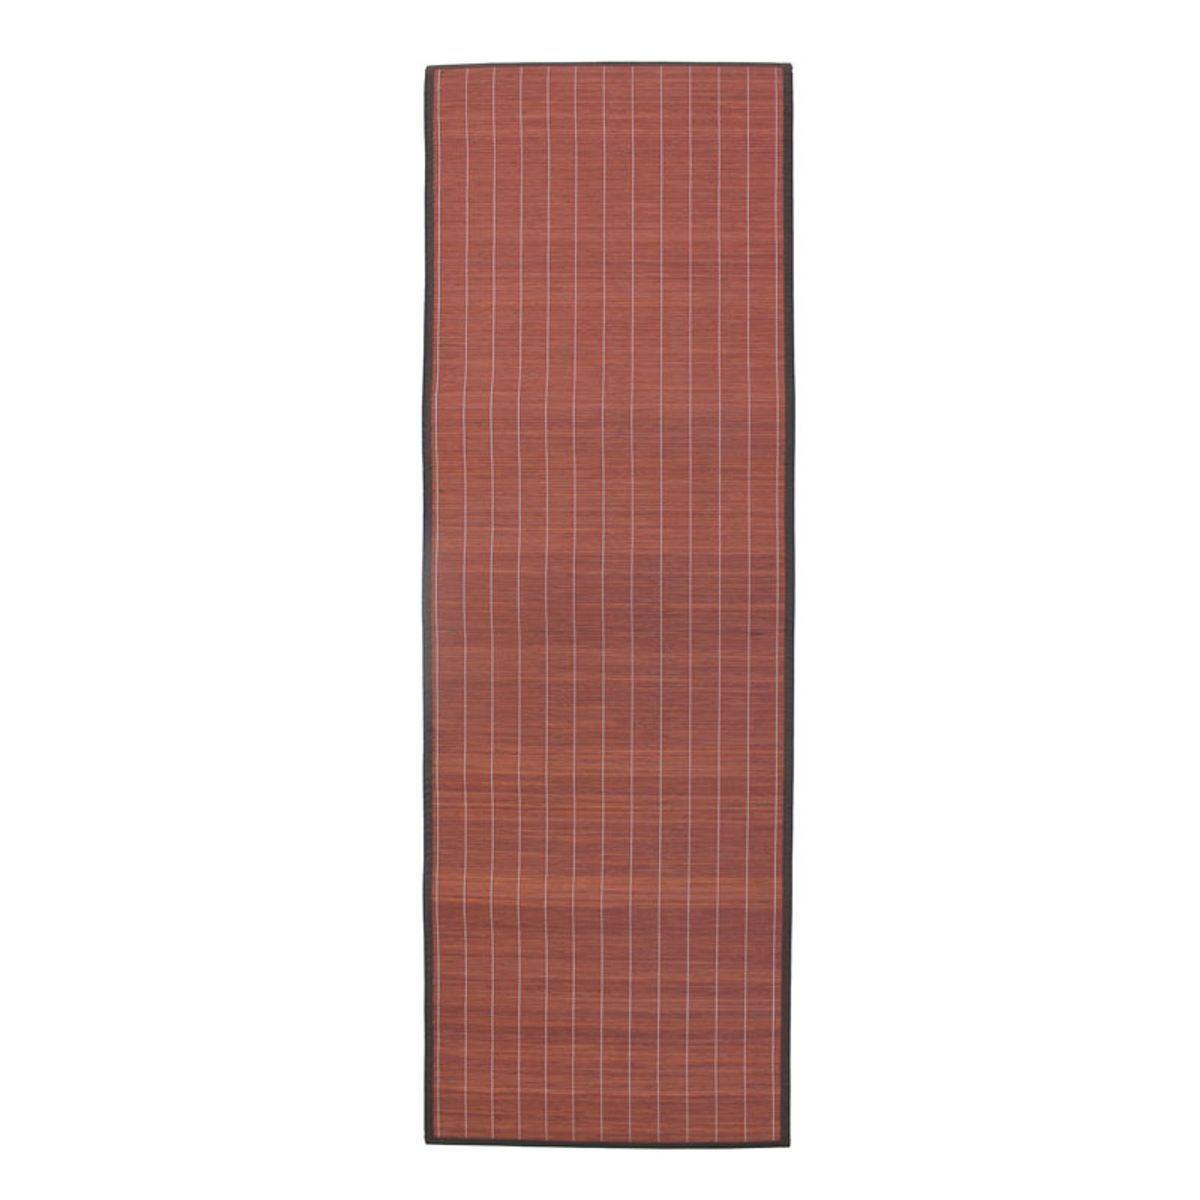 TheDecoFactory BALI CHIC - Tapis en bambou chocolat 200x65 Marron